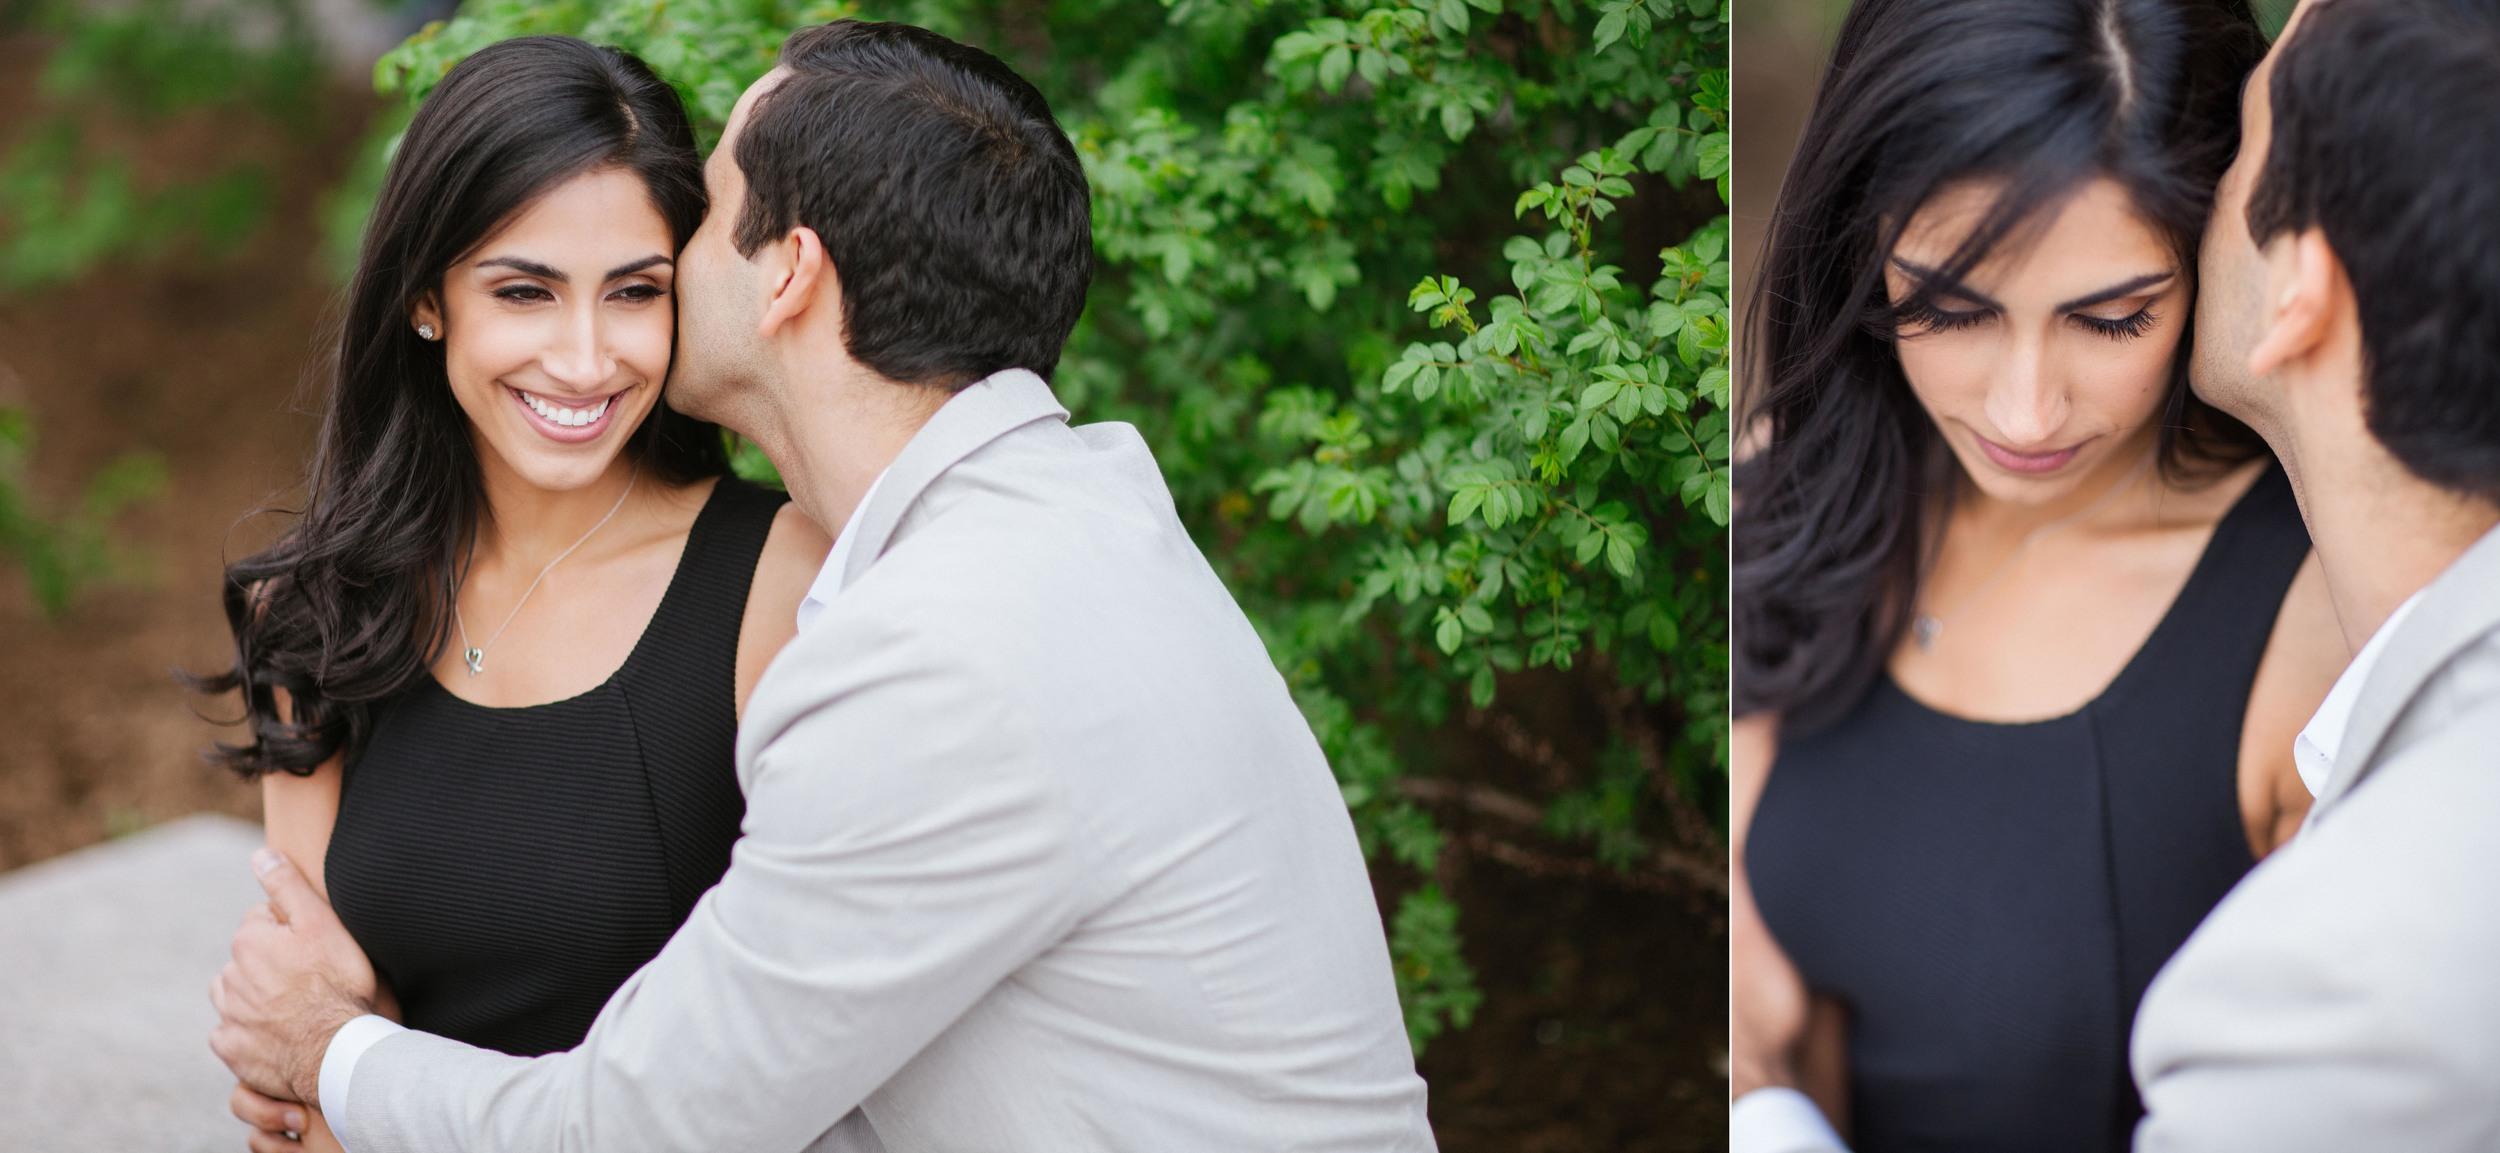 St Louis Wedding Photography-1027 copy.jpg